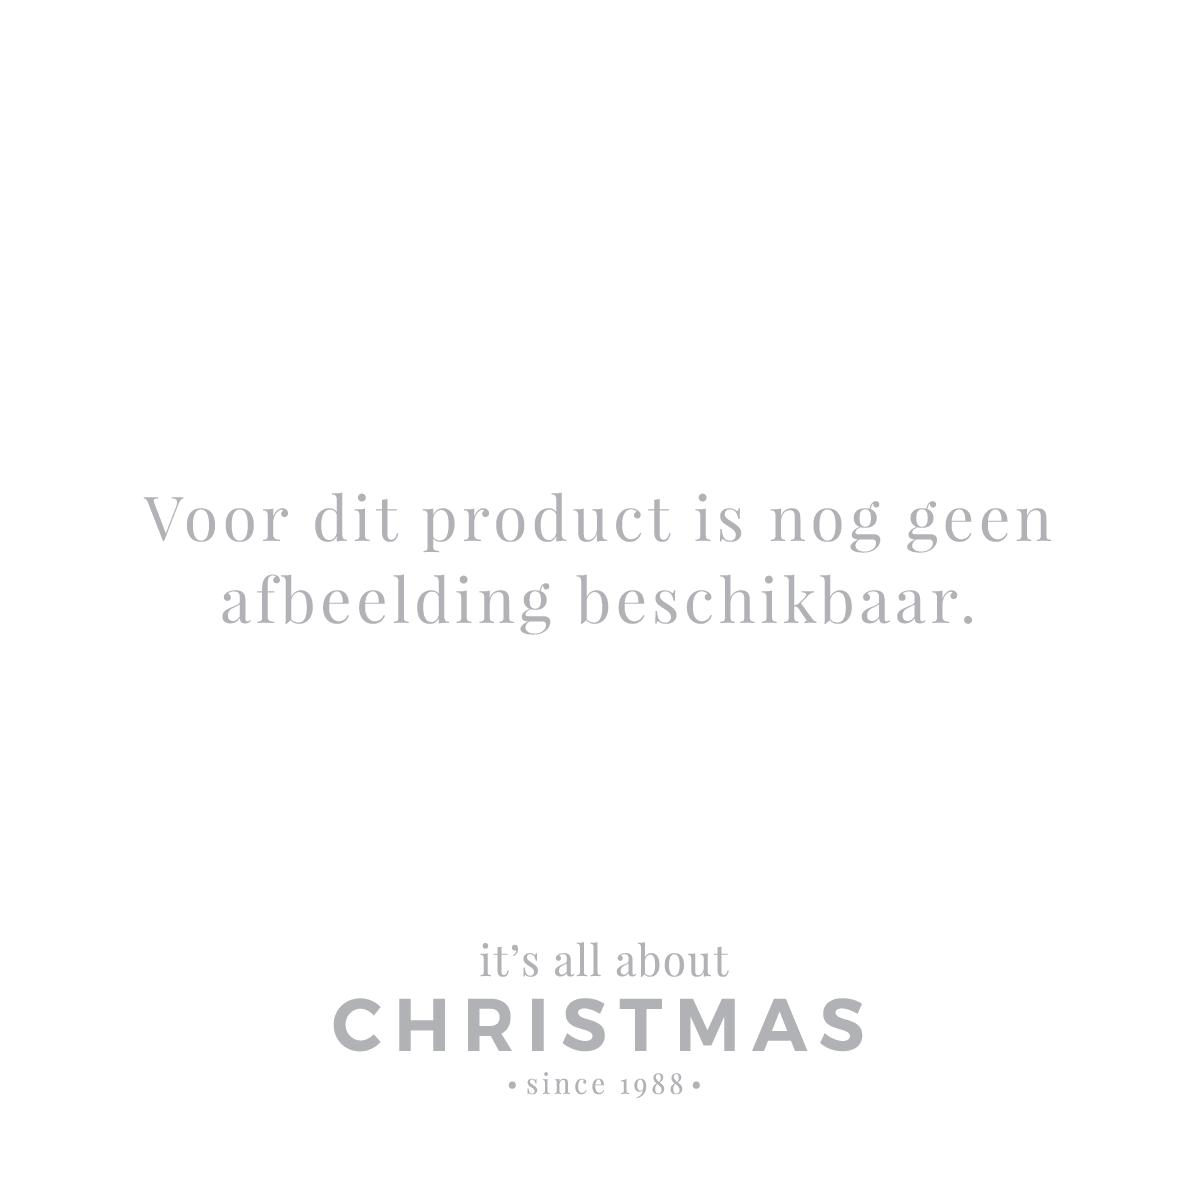 Bling-Bling Stern grau-schwarz, aus Kunststoff, 10,5 cm